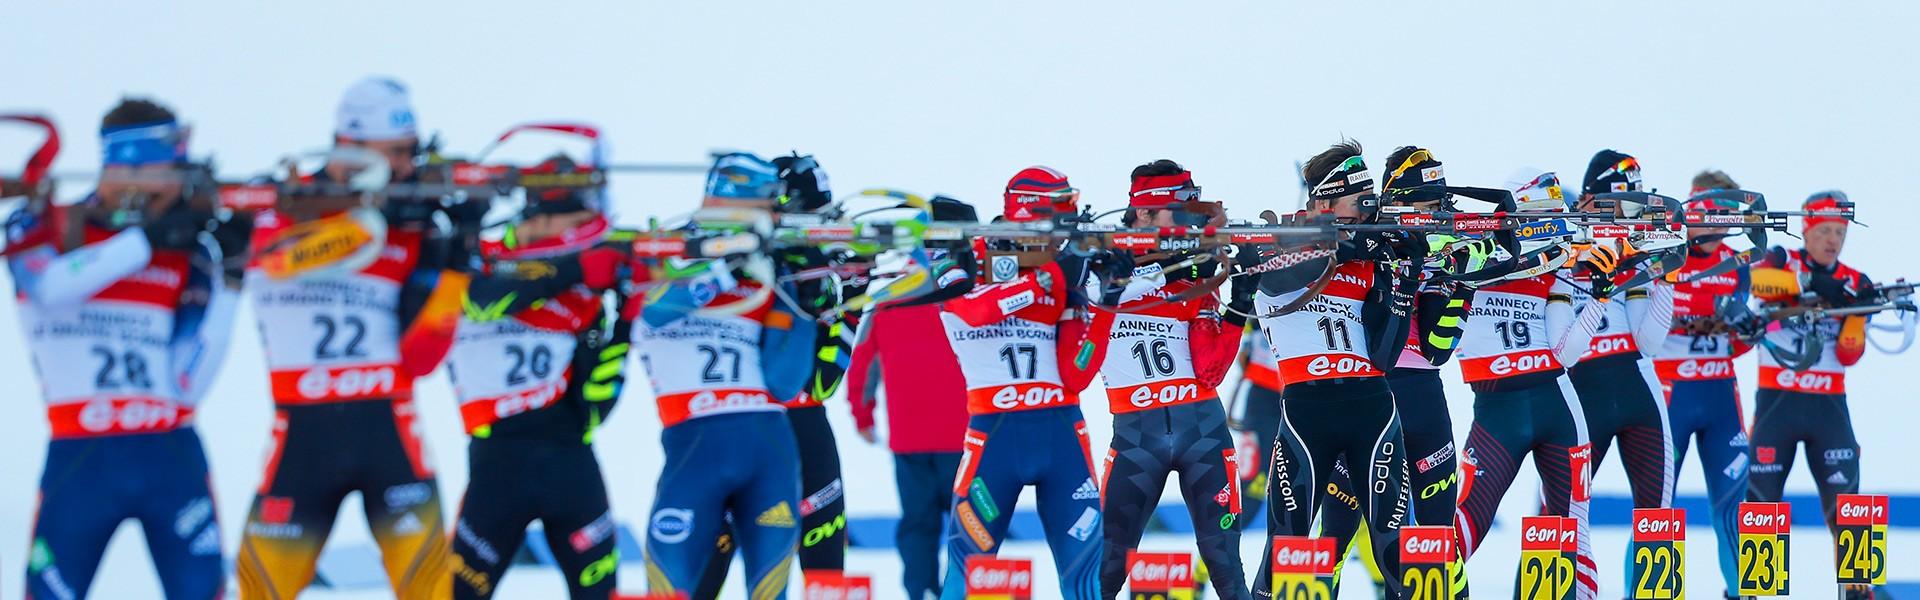 biathlon-zoom-agence-s-gruden-2223